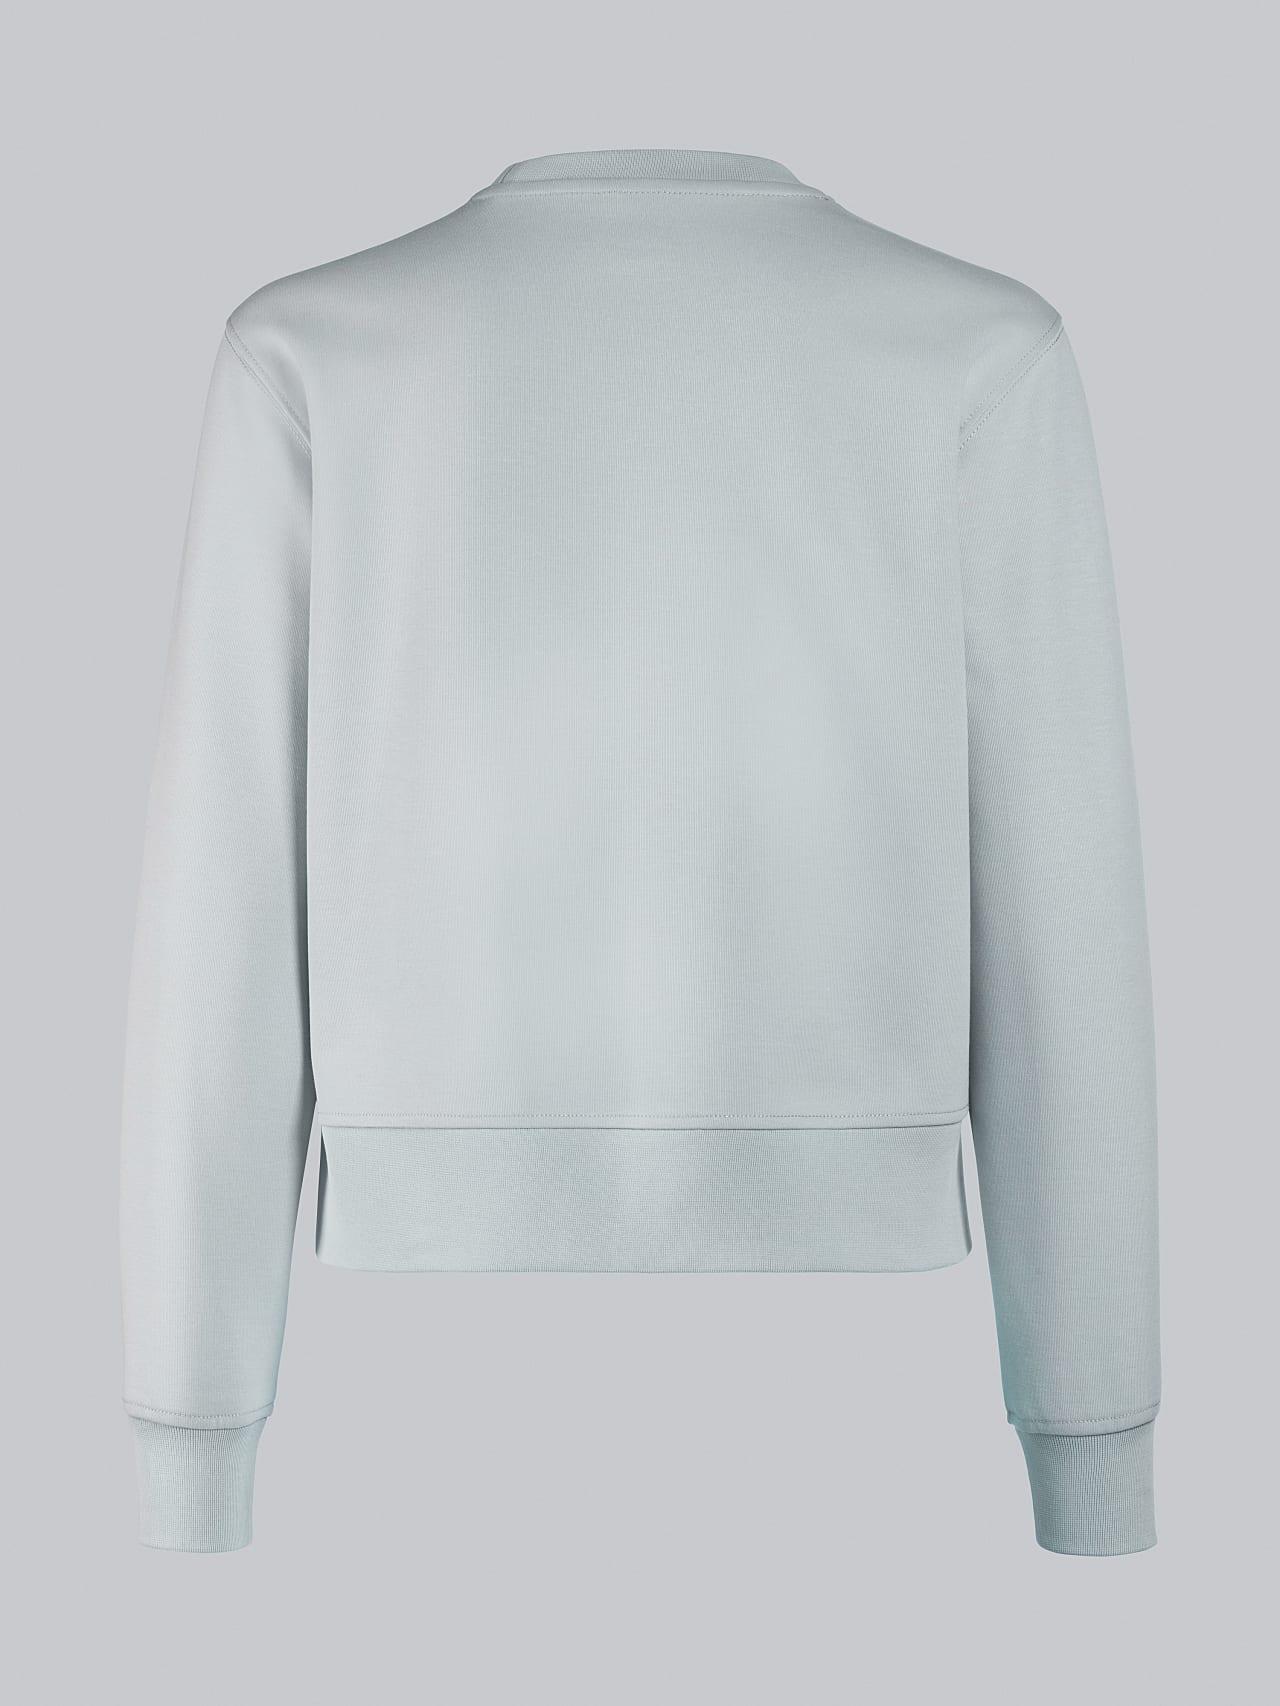 SHINT V1.Y5.02 Premium Logo Sweater Pale Blue  Left Alpha Tauri